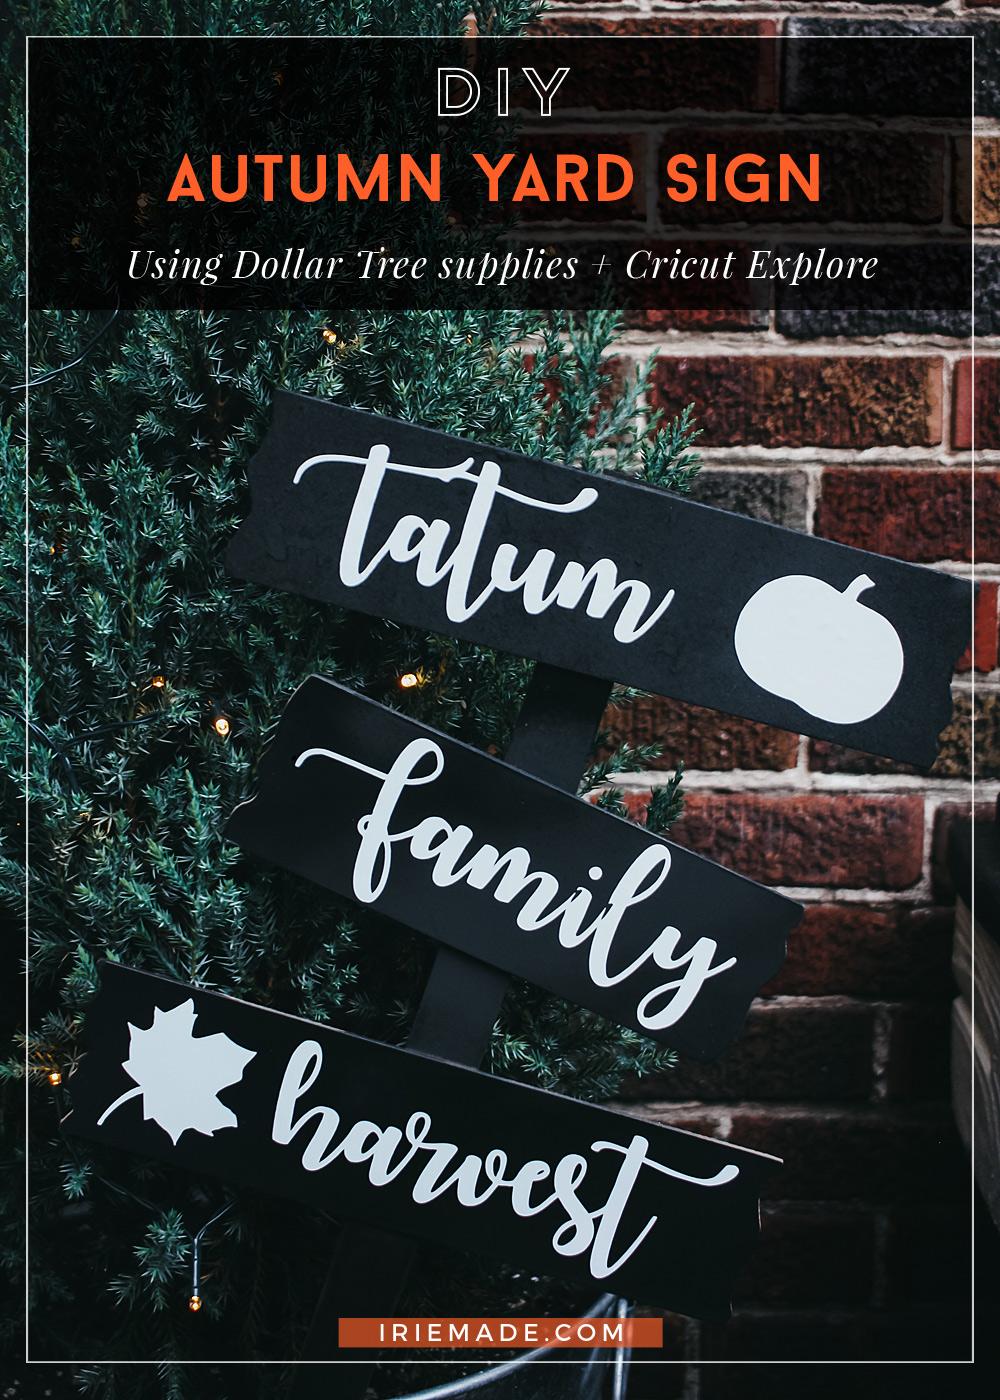 DIY Autumn Yard Sign Using Dollar Tree + Cricut Explore